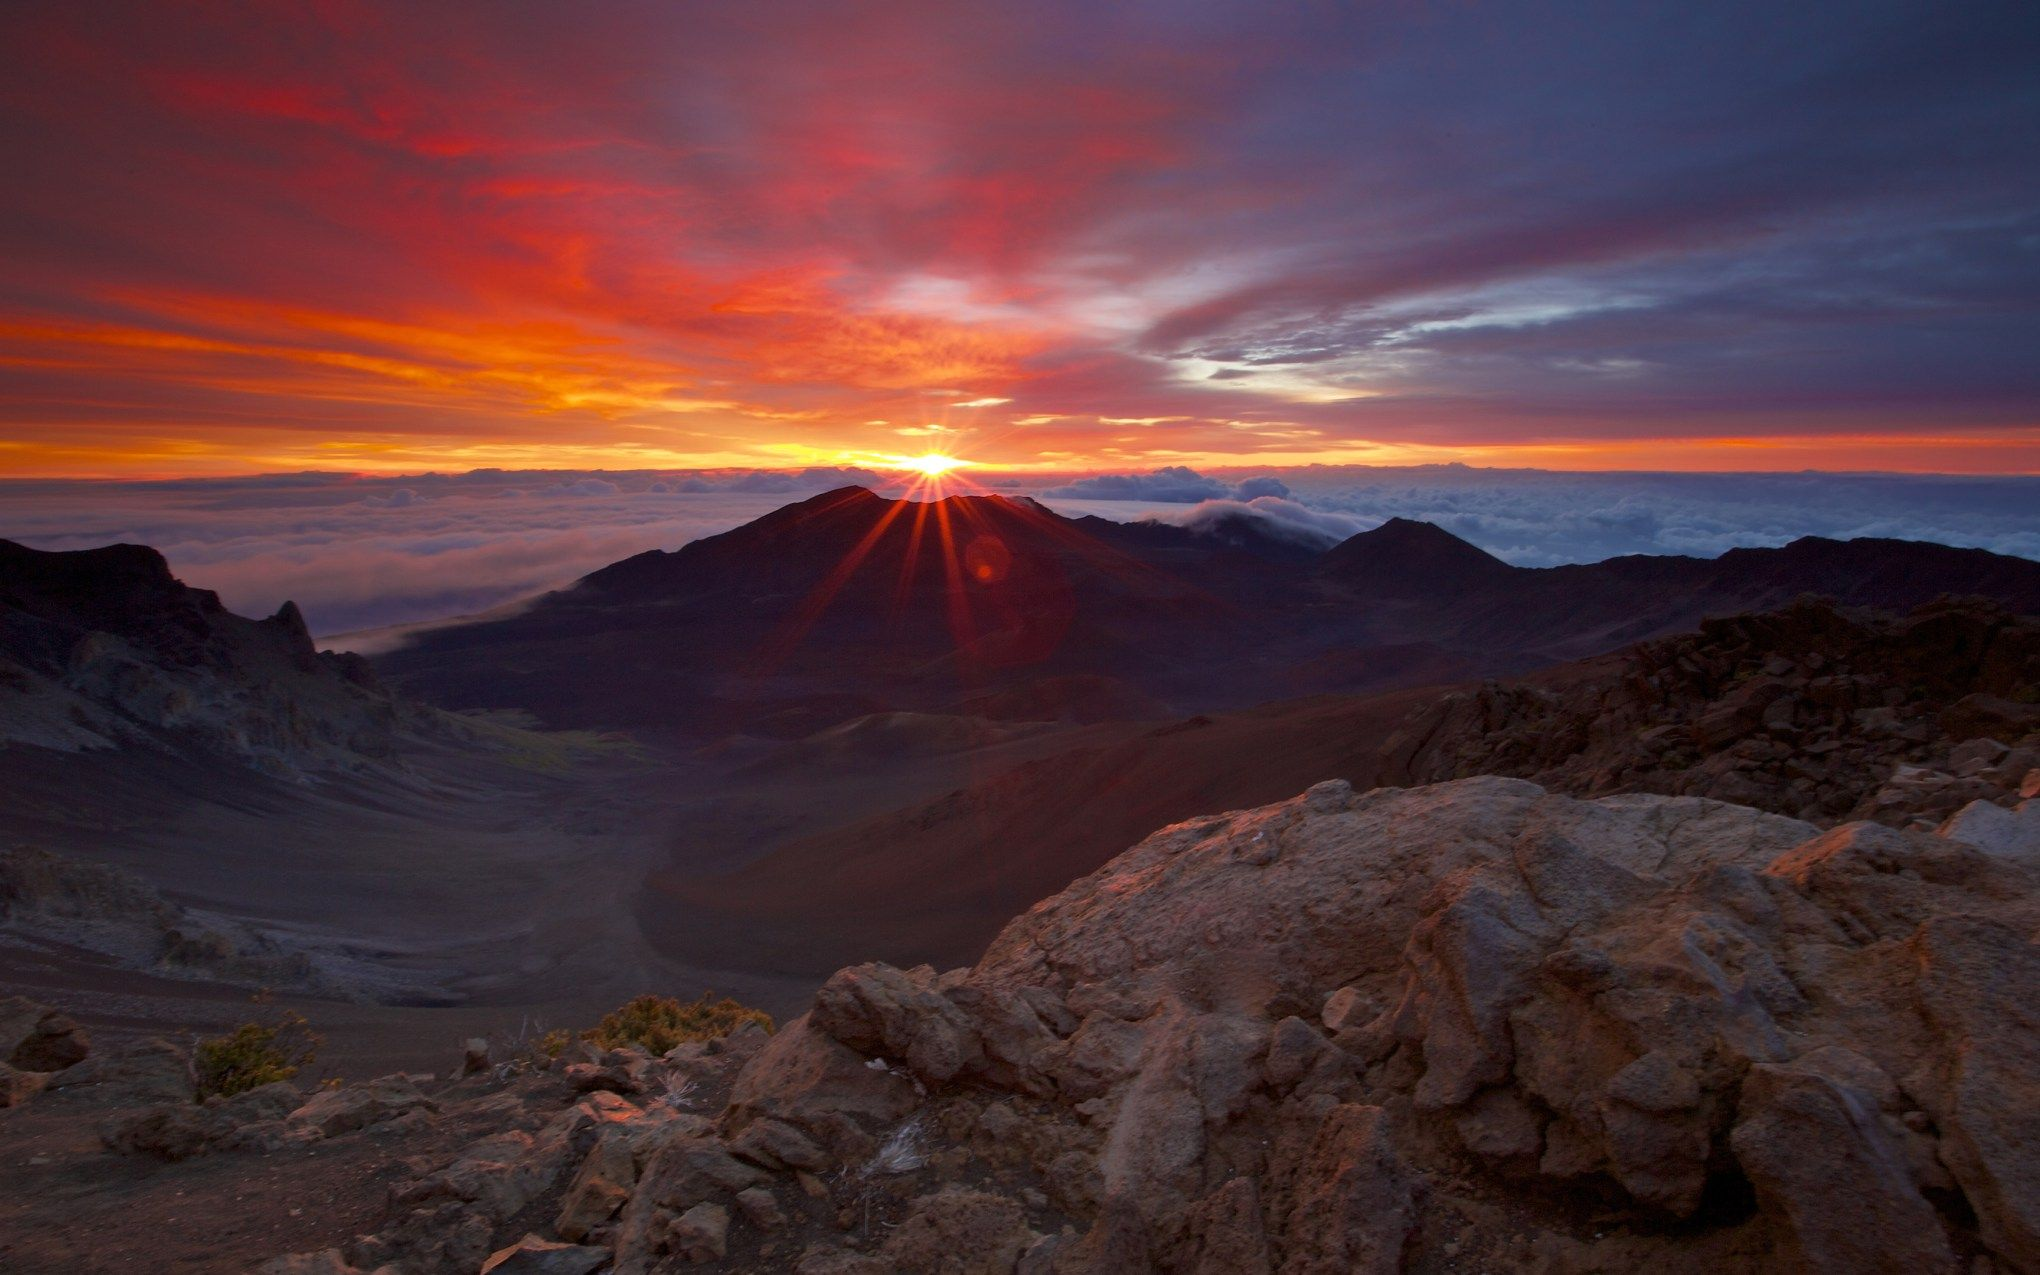 Desktop Landscape Mountain Sunrise Landscape Wallpaper Sunset Wallpaper Landscape